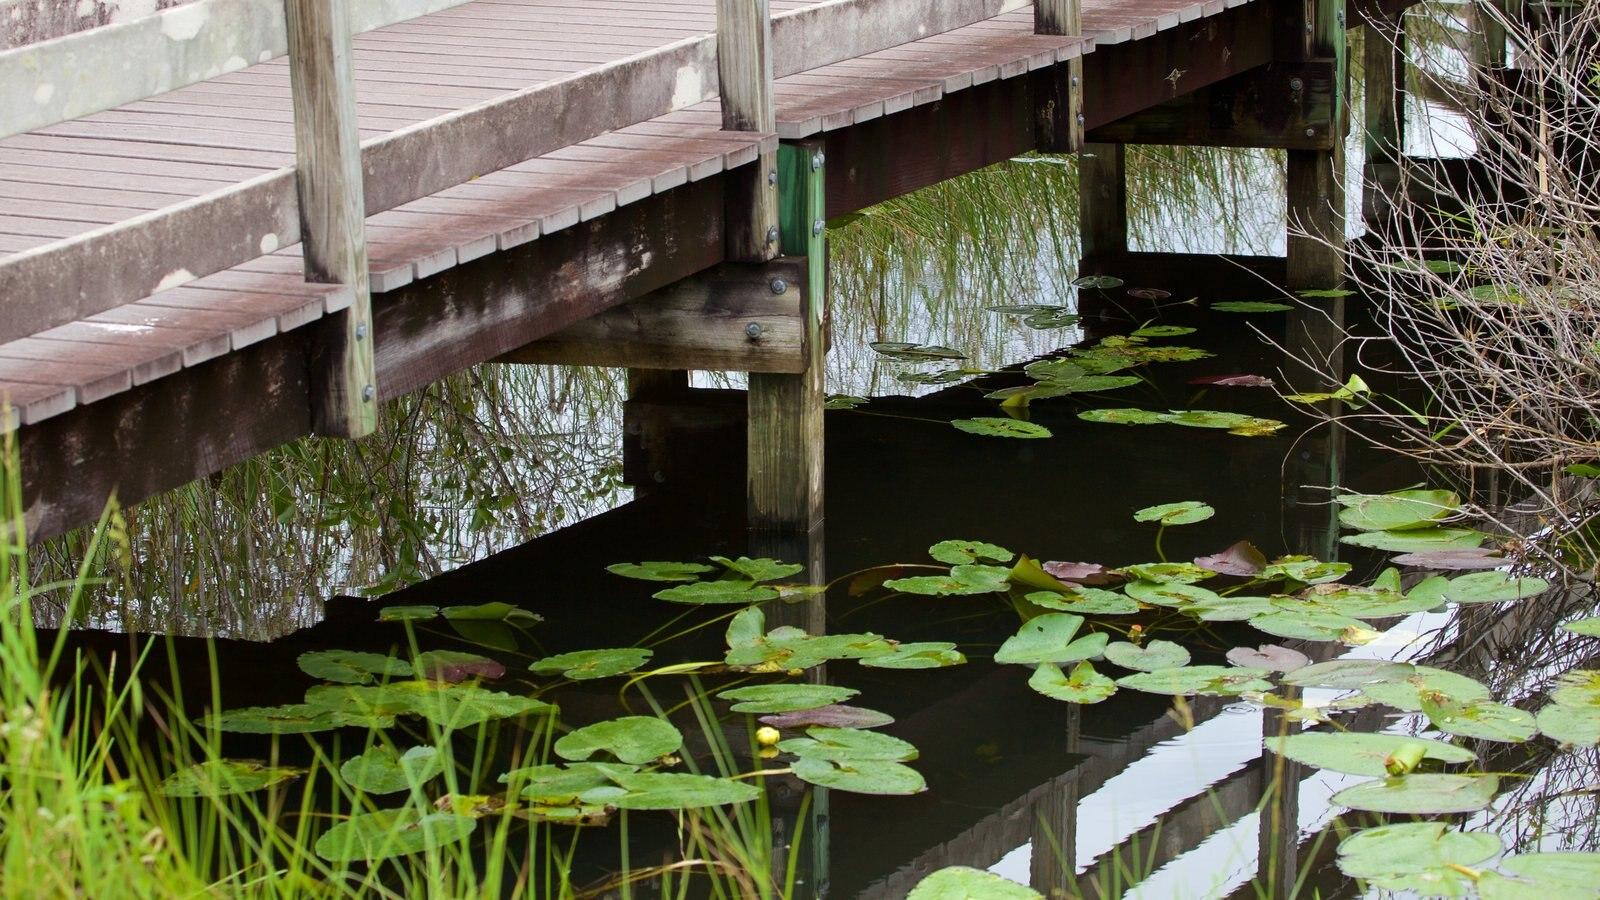 Southeast Florida showing a lake or waterhole and a bridge